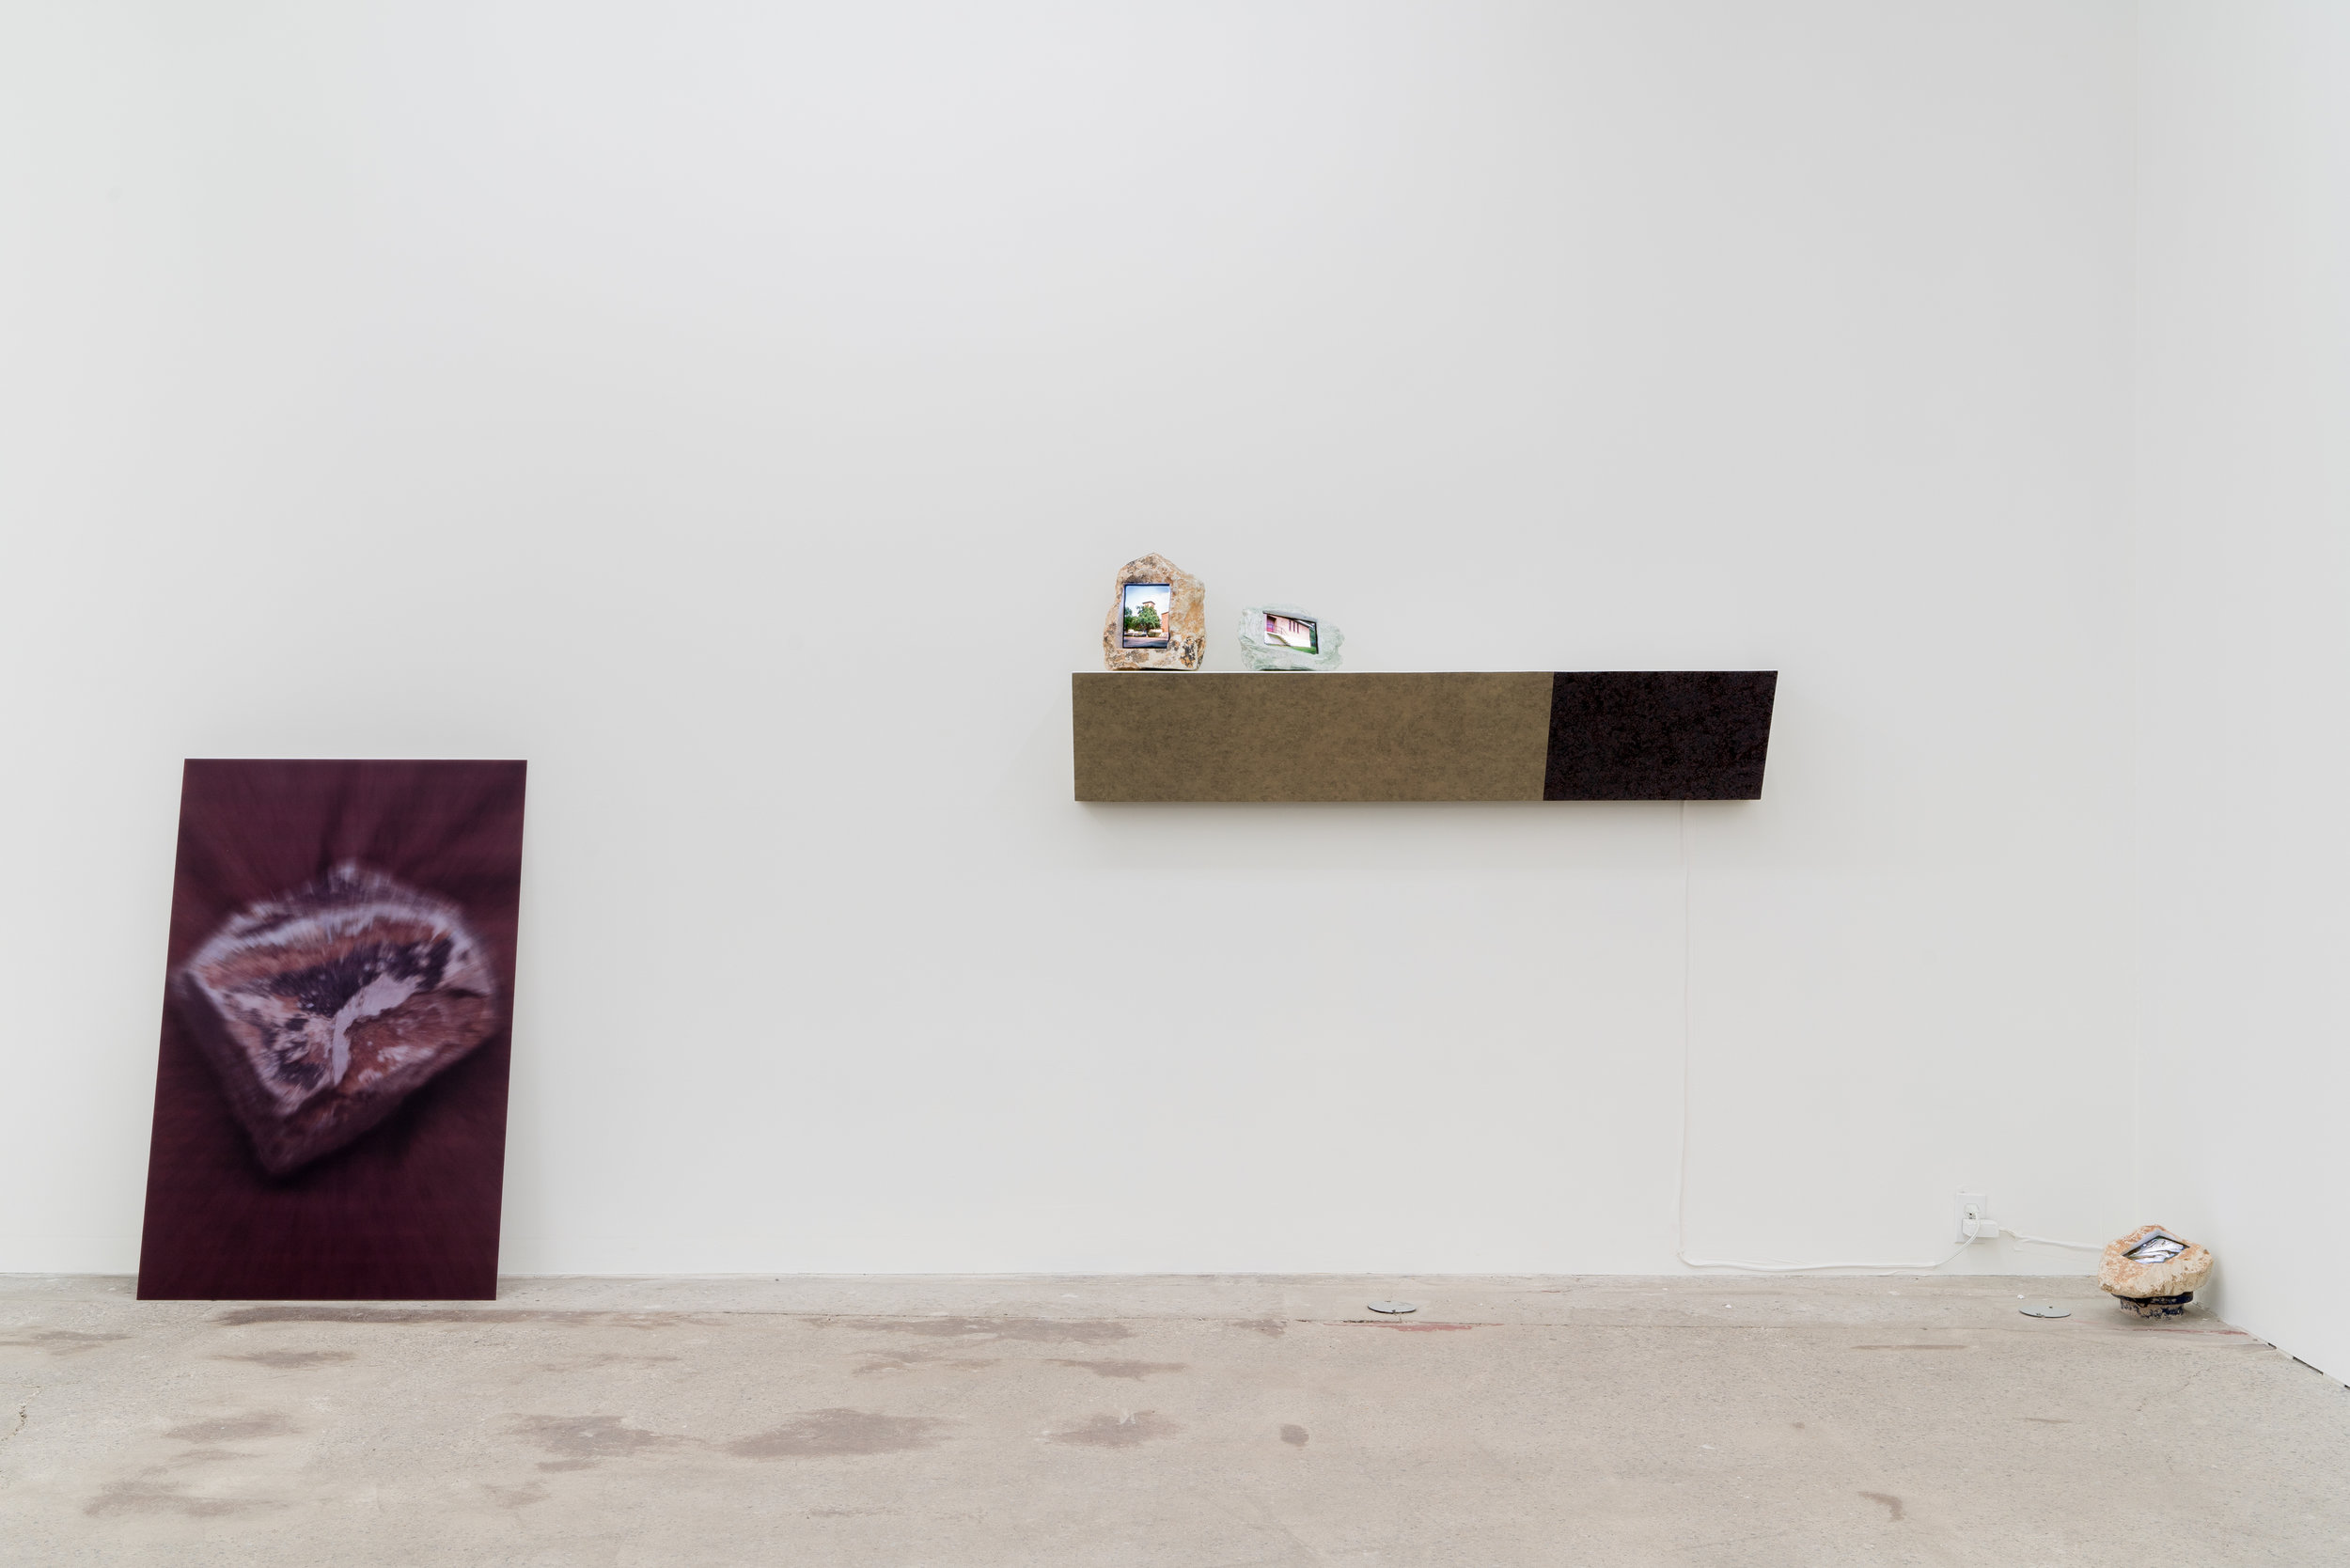 GalerieNicolasRobertNovembre2018 (10 of 27).jpg